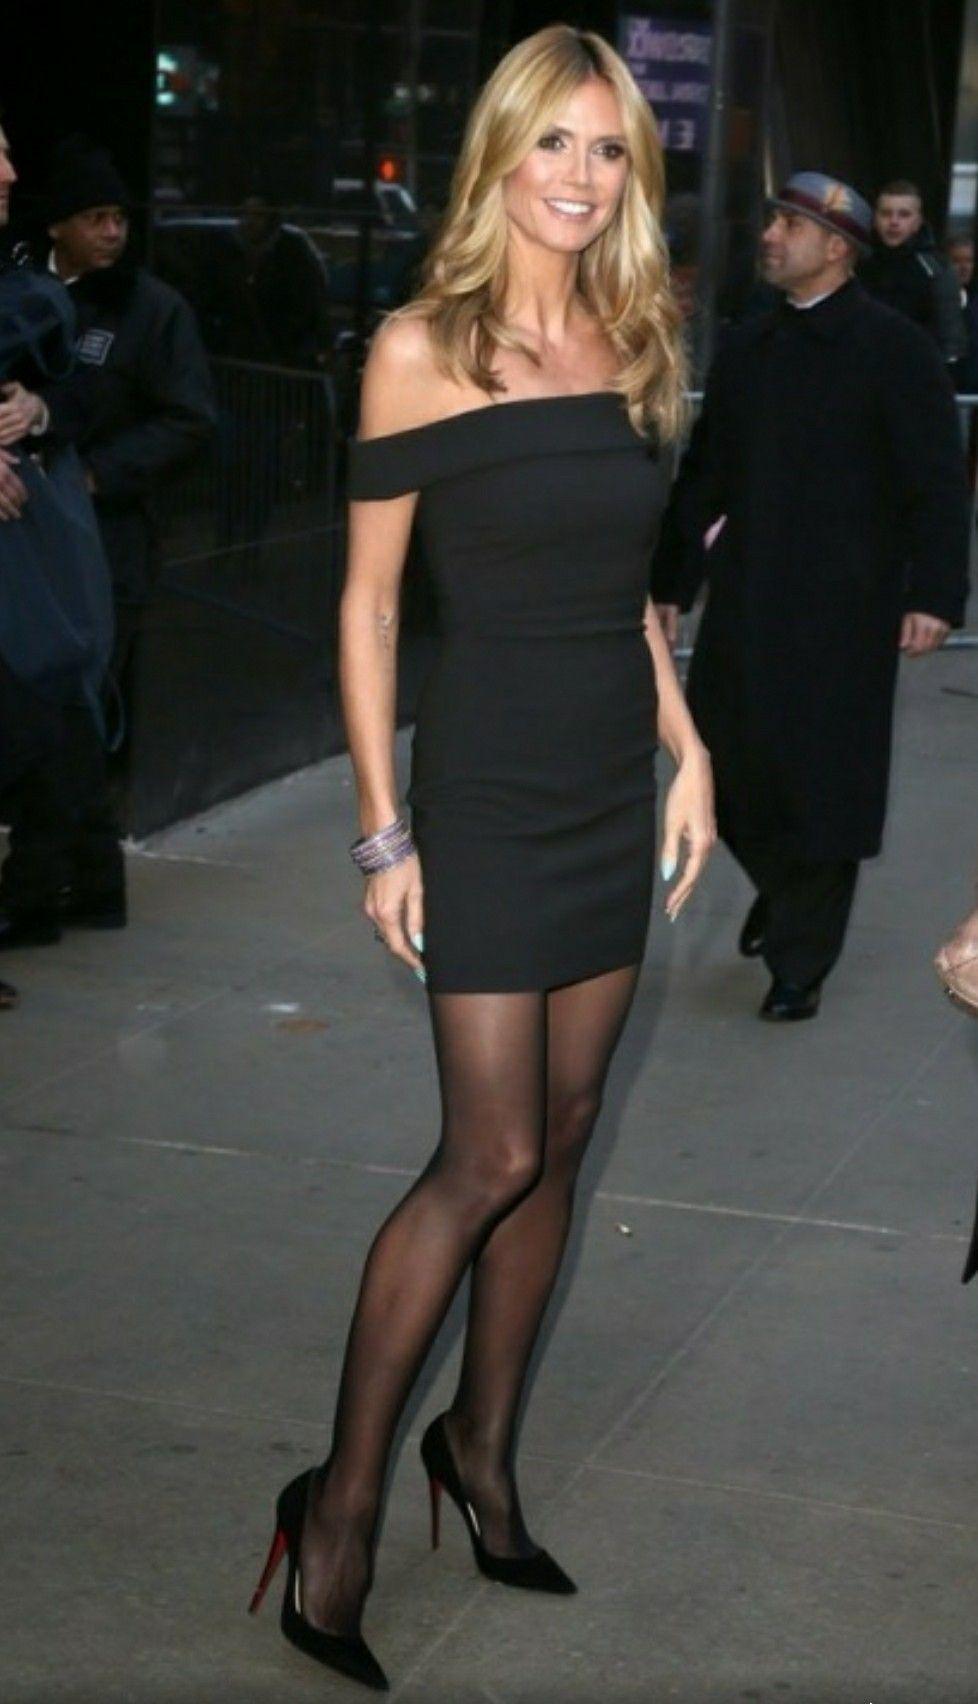 4ad6cb0f56d Heidi Klum sexy black dress with sheer black pantyhose and heels ...